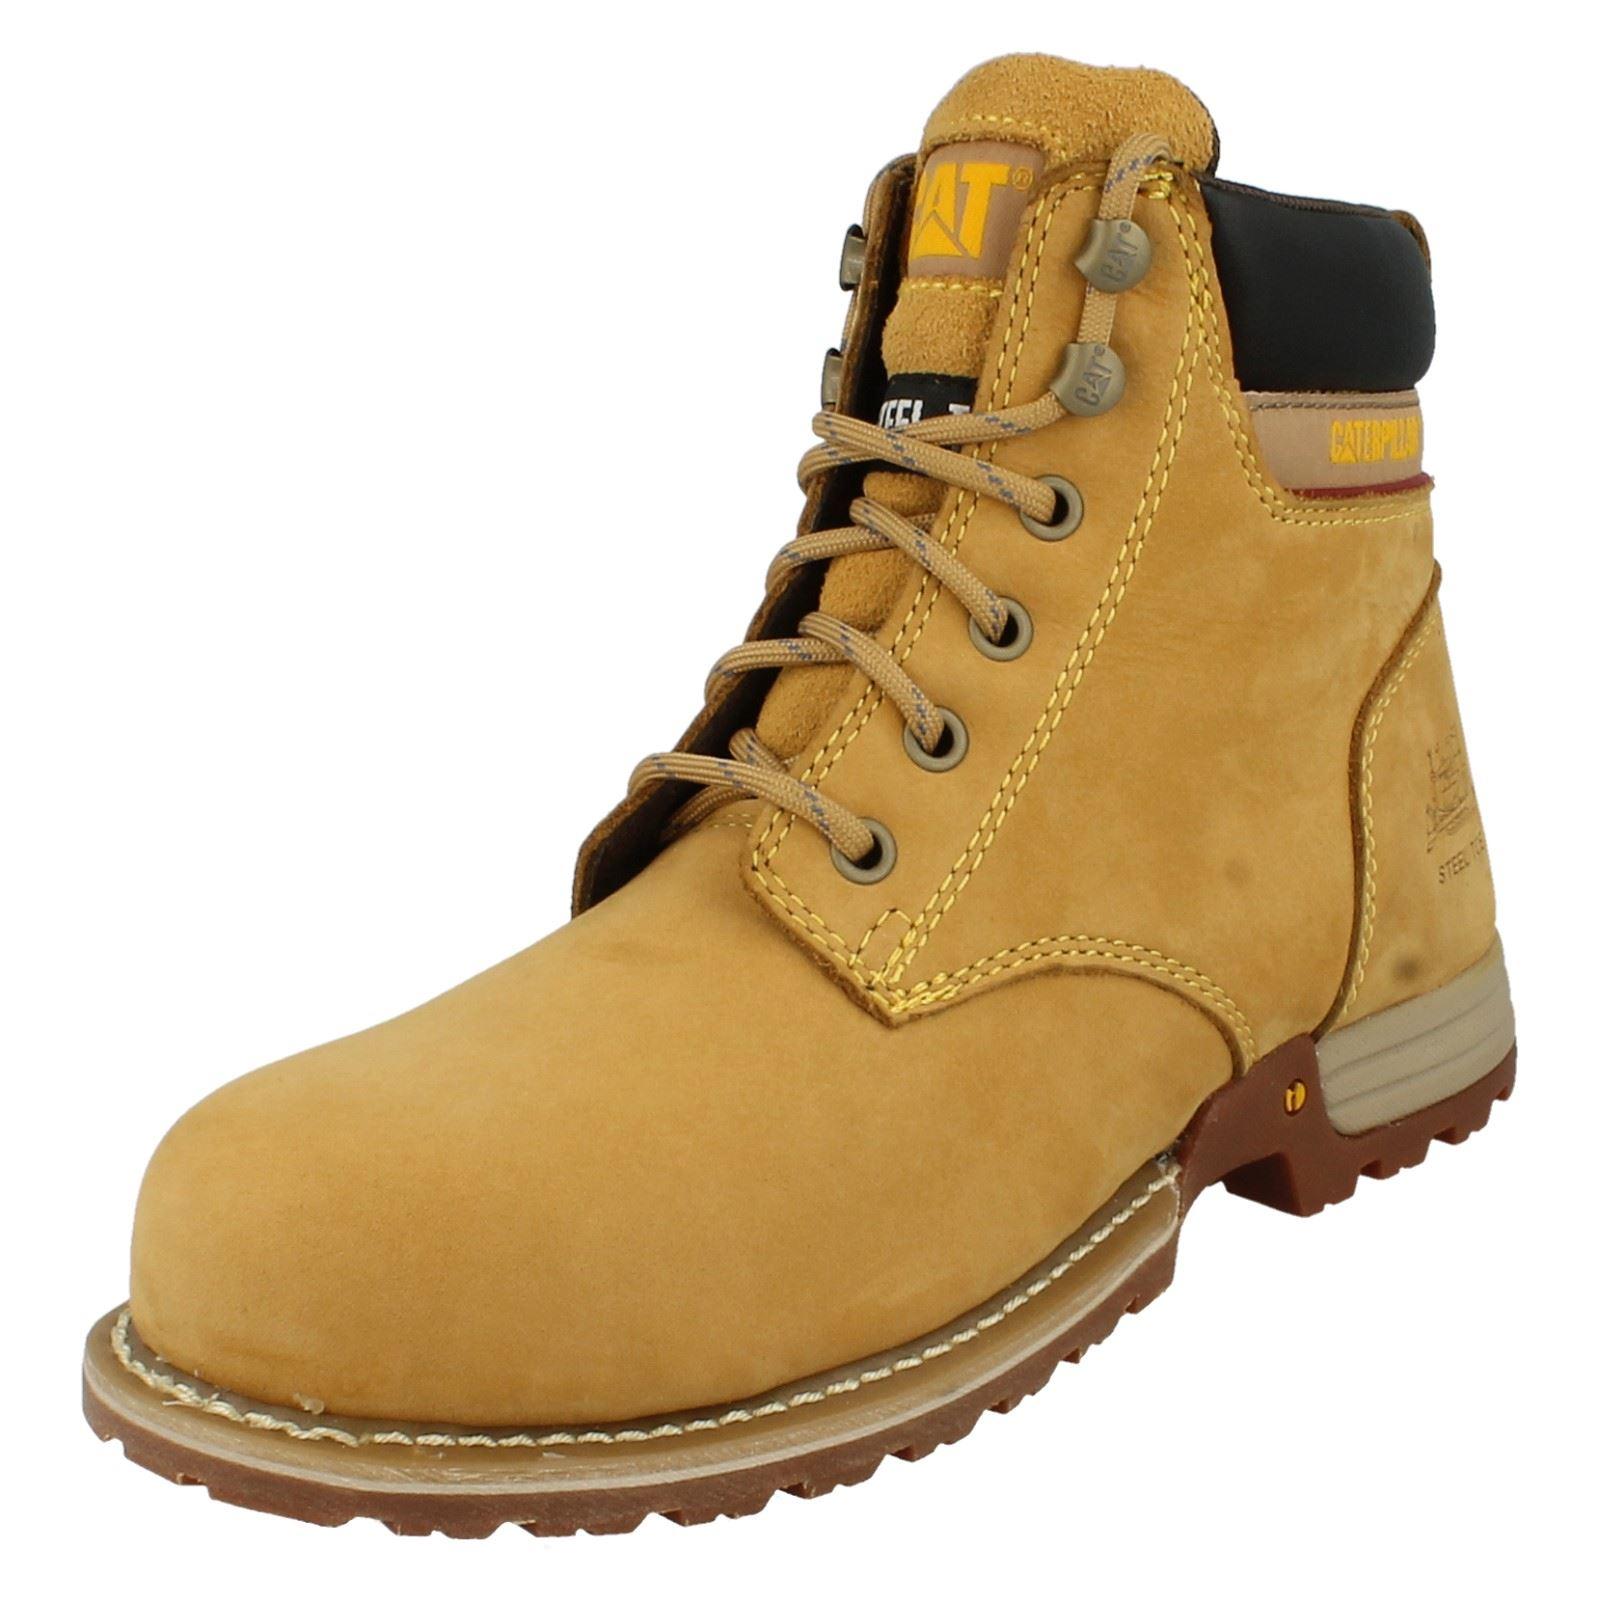 New NewCaterpillarColoradoBlackMensAnkleBootsShoesOnlineFootwear